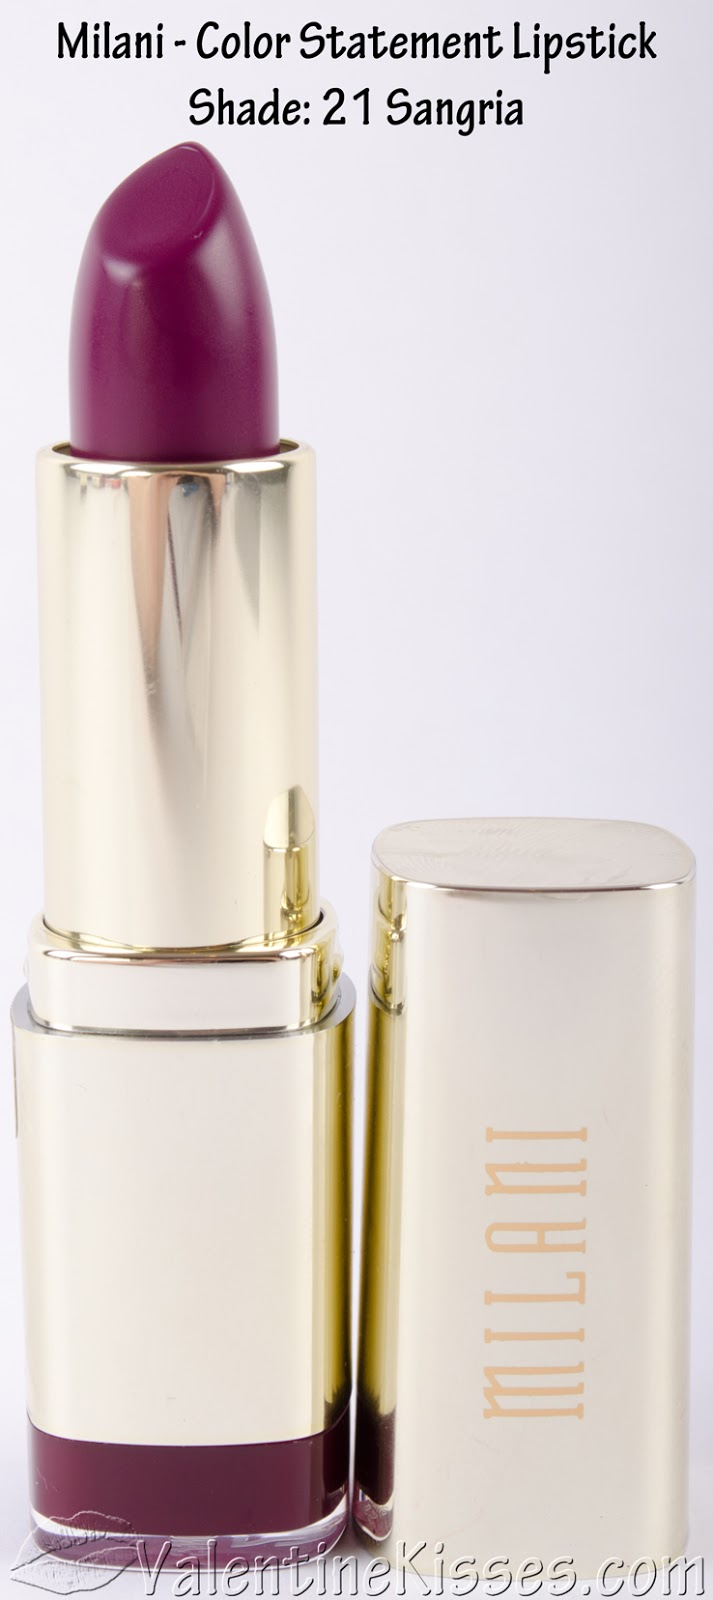 All Shades Of Kylie Lip Kits: Valentine Kisses: Milani Color Statement Lipstick